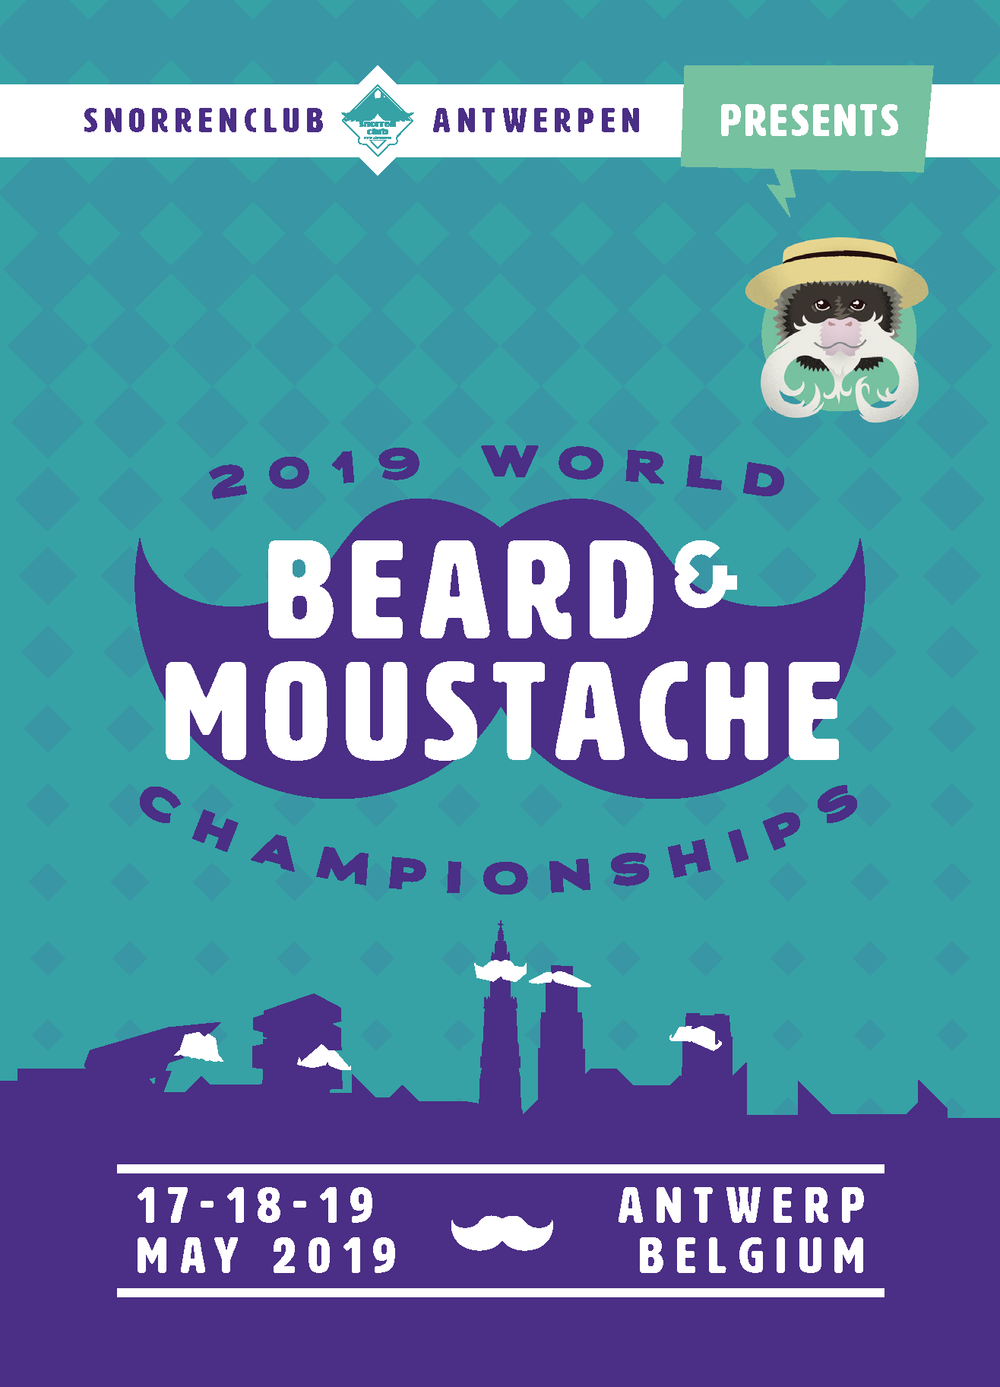 2019 World Beard & Moustache Championships